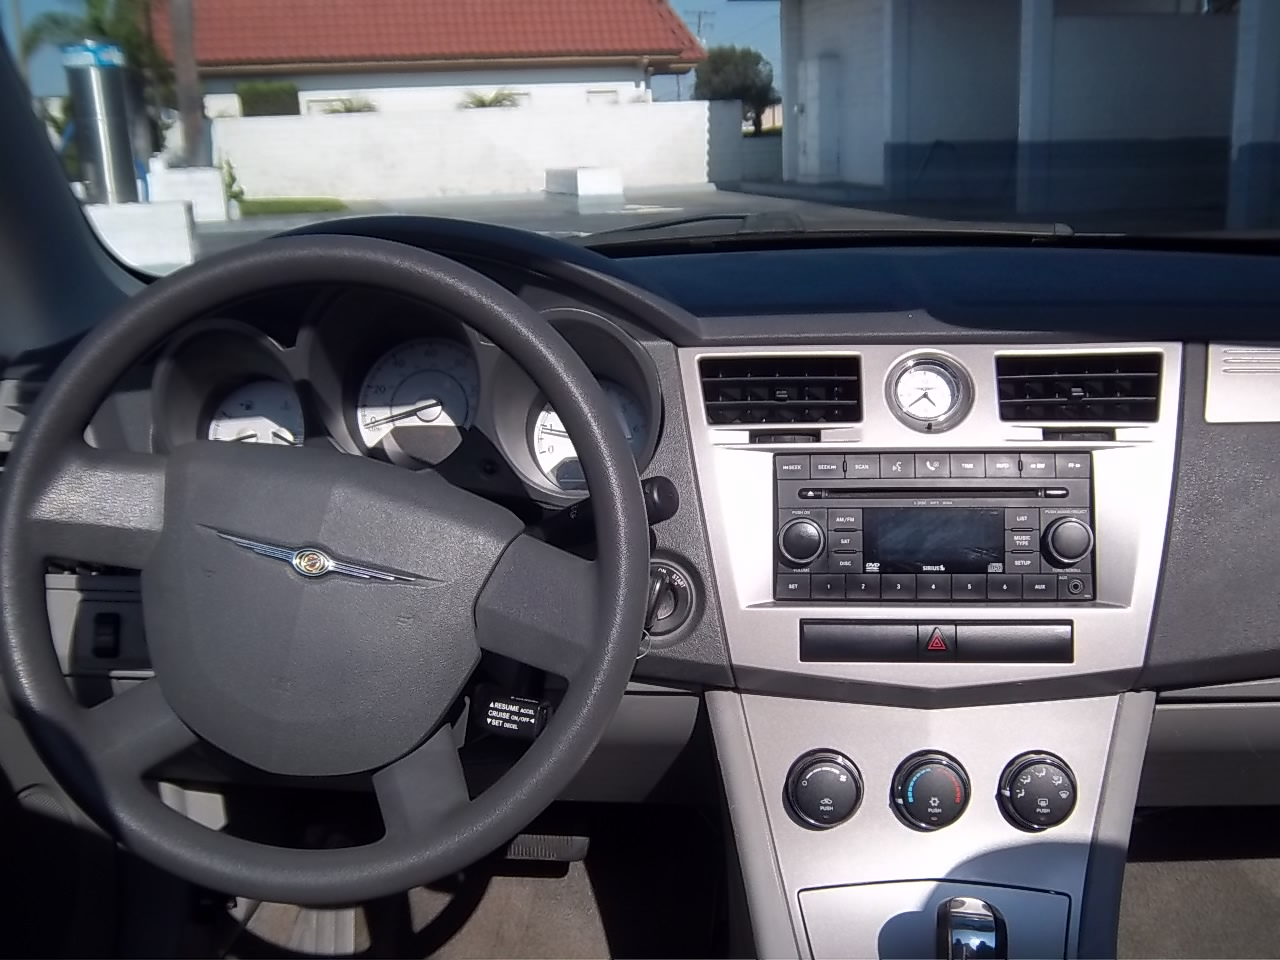 Chrysler Sebring Lx Convertible Pic on 2003 Chrysler Voyager Lx